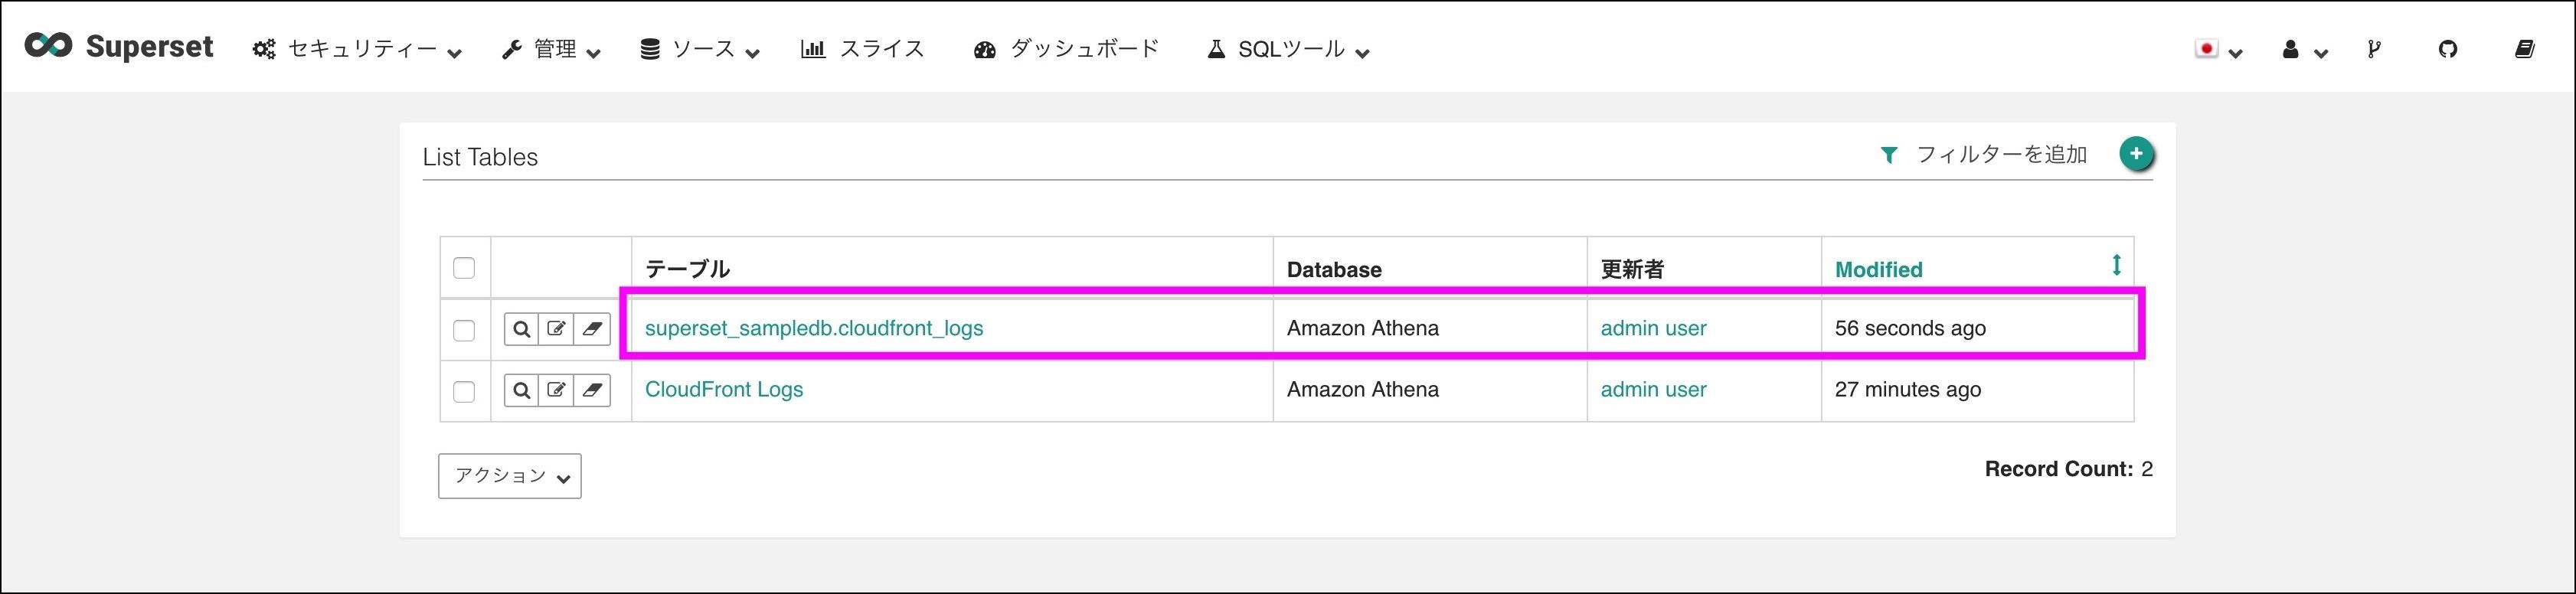 Apache SupersetでAmazon Athenaのクエリ結果をビジュアライズ